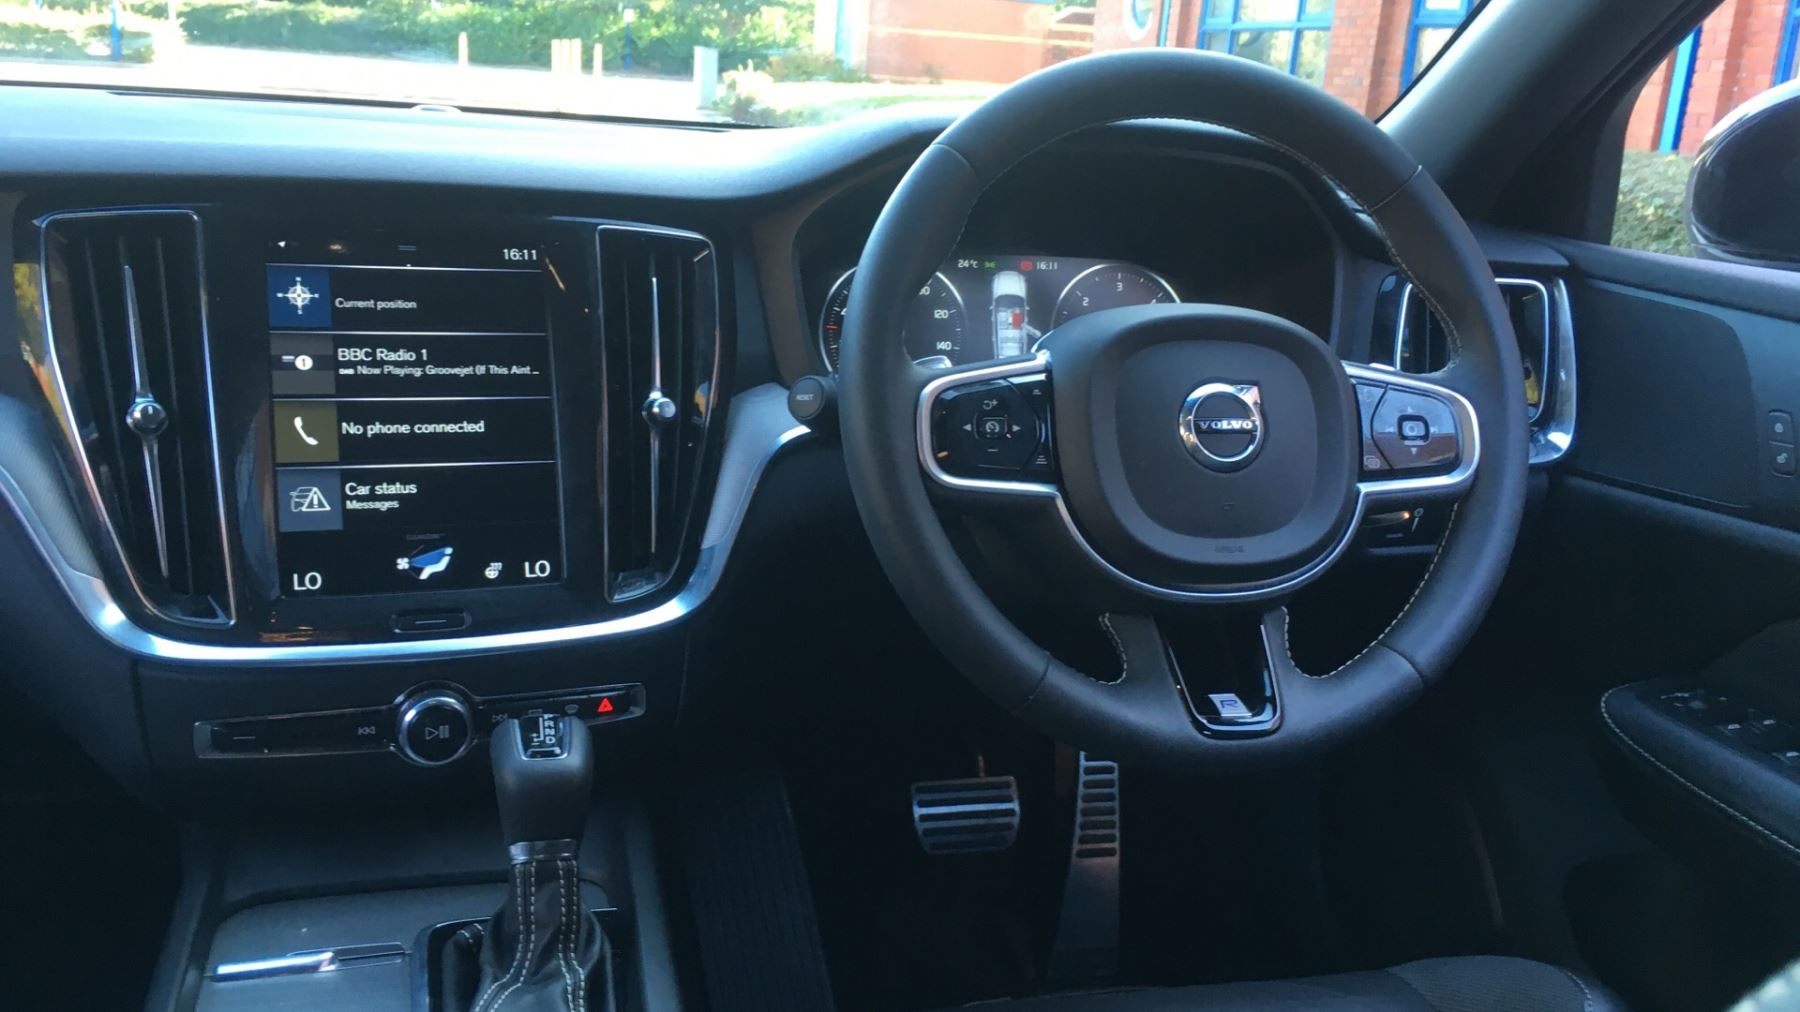 Volvo V60 2.0 D4 [190] R DESIGN 5dr - Volvo on Call, DAB Radio, SAT NAV, Park Assist image 6